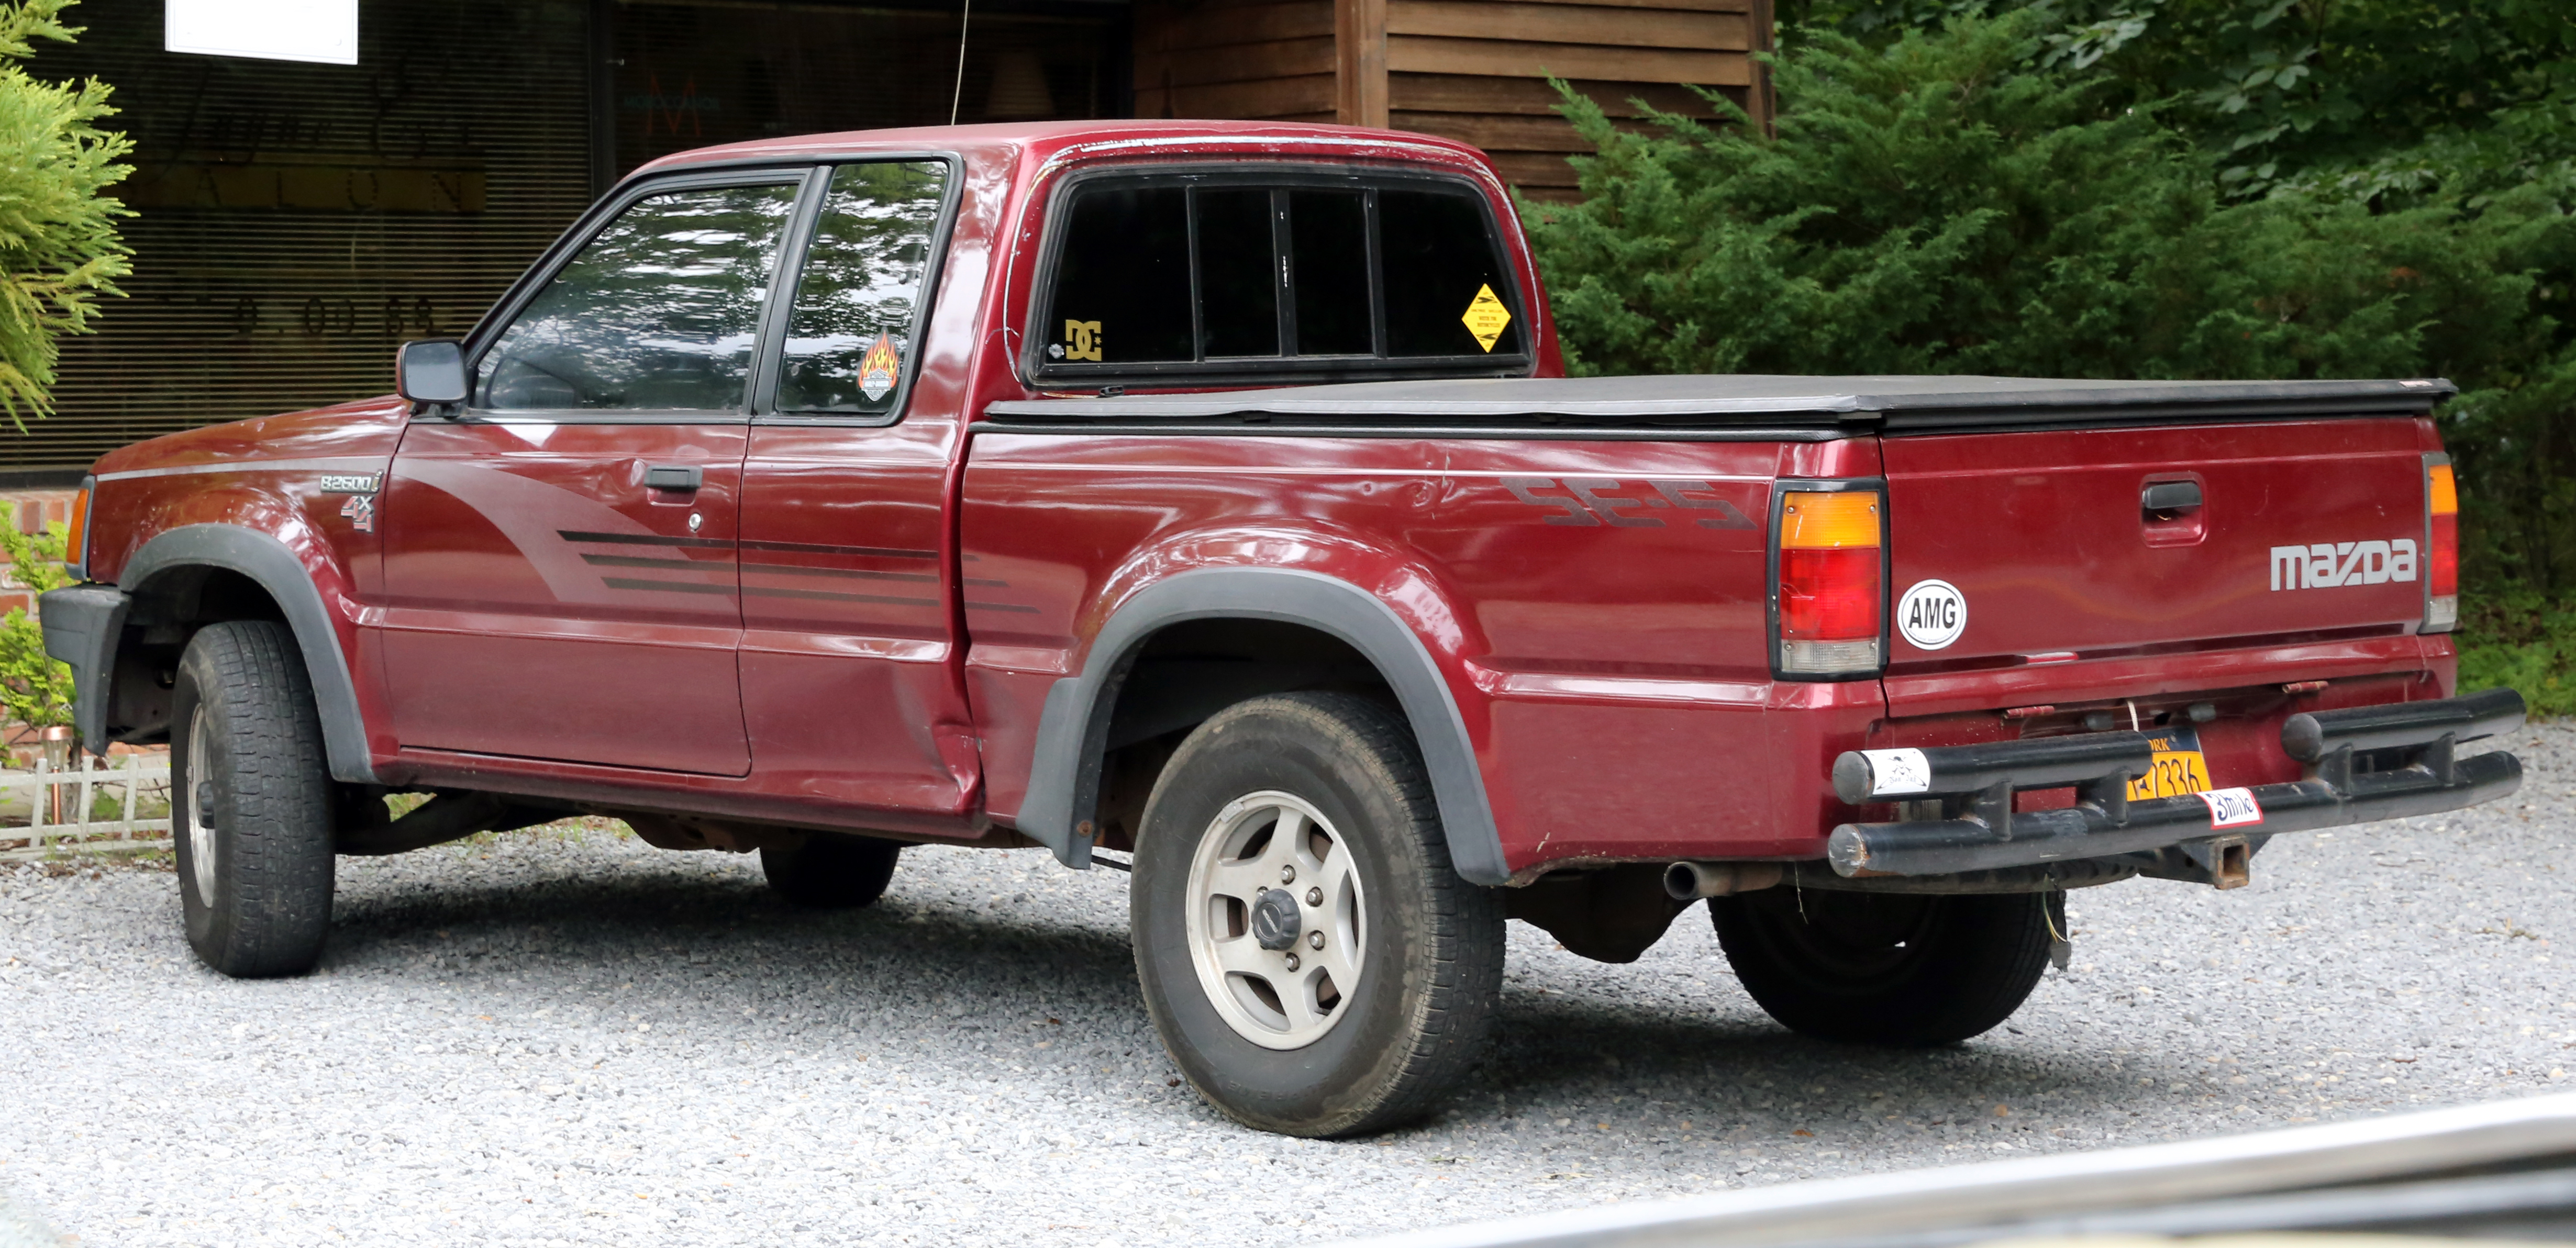 File:Mazda B2600 i SE-5 4x4 extended cab.jpg - Wikimedia Commons